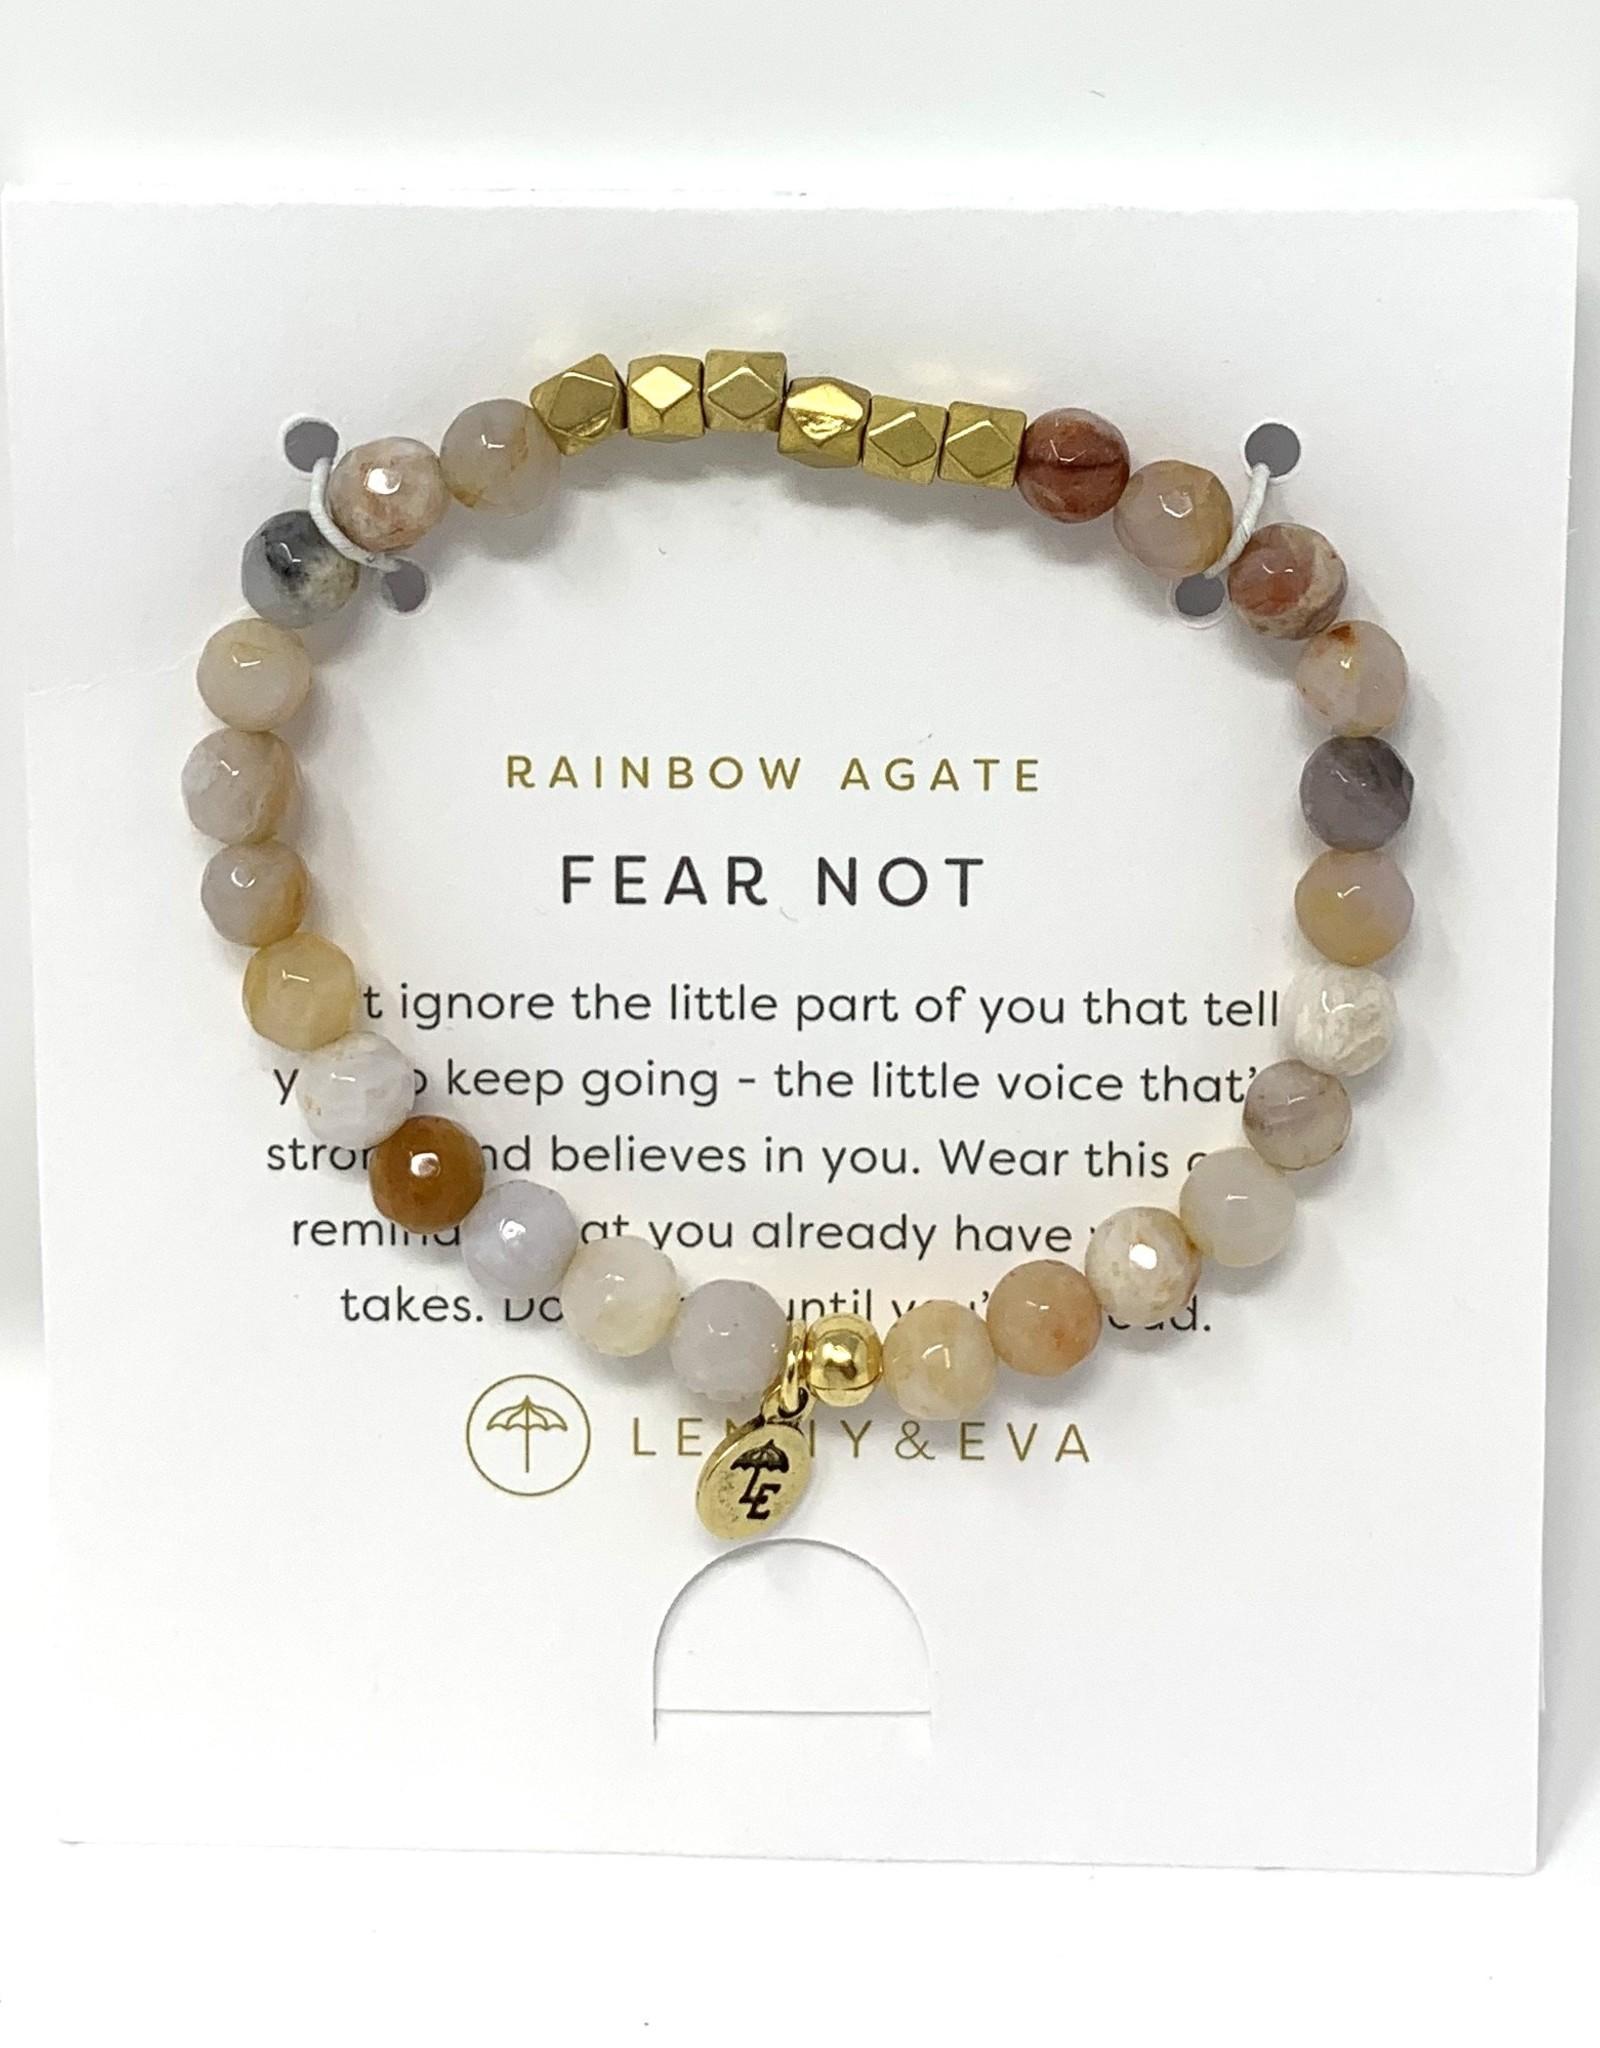 Lenny & Eva Gemstone Bracelet Rainbow Agate Fear Not